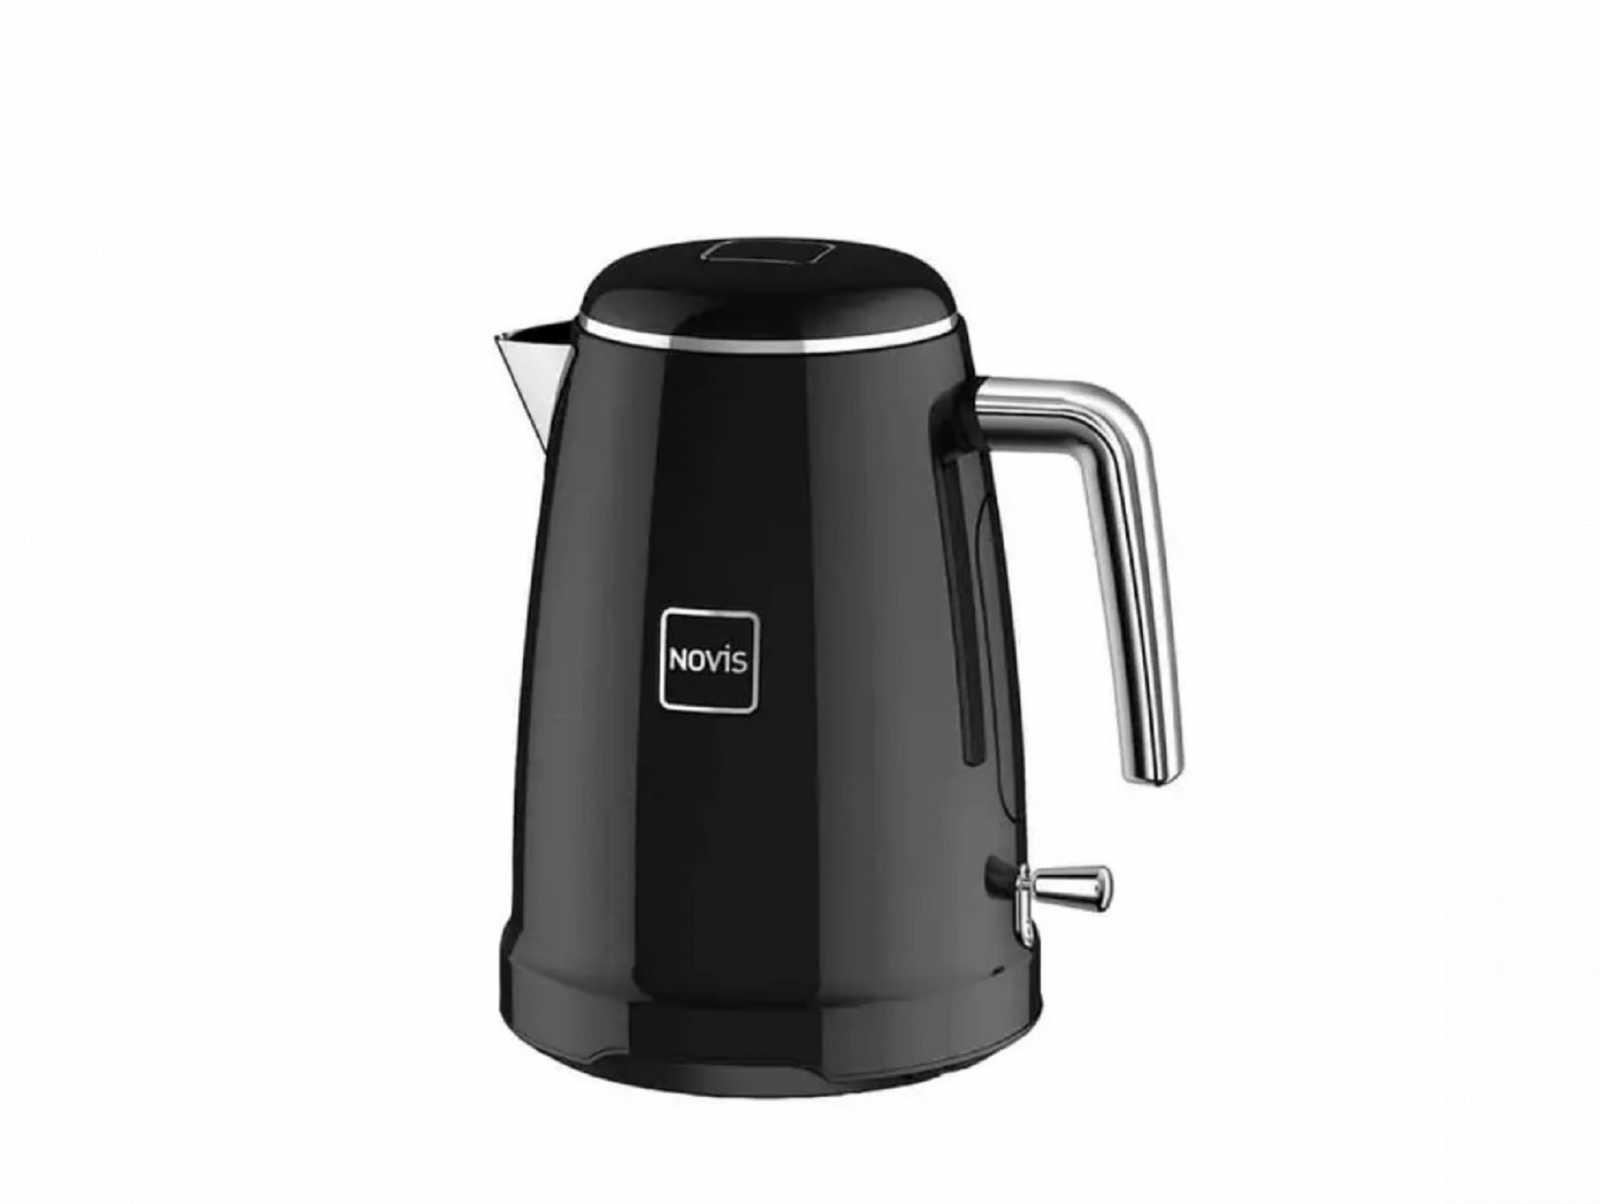 Онлайн каталог PROMENU: Чайник электрический Novis Kettle K1, объем 1,7 л, черный                               6113.03.20